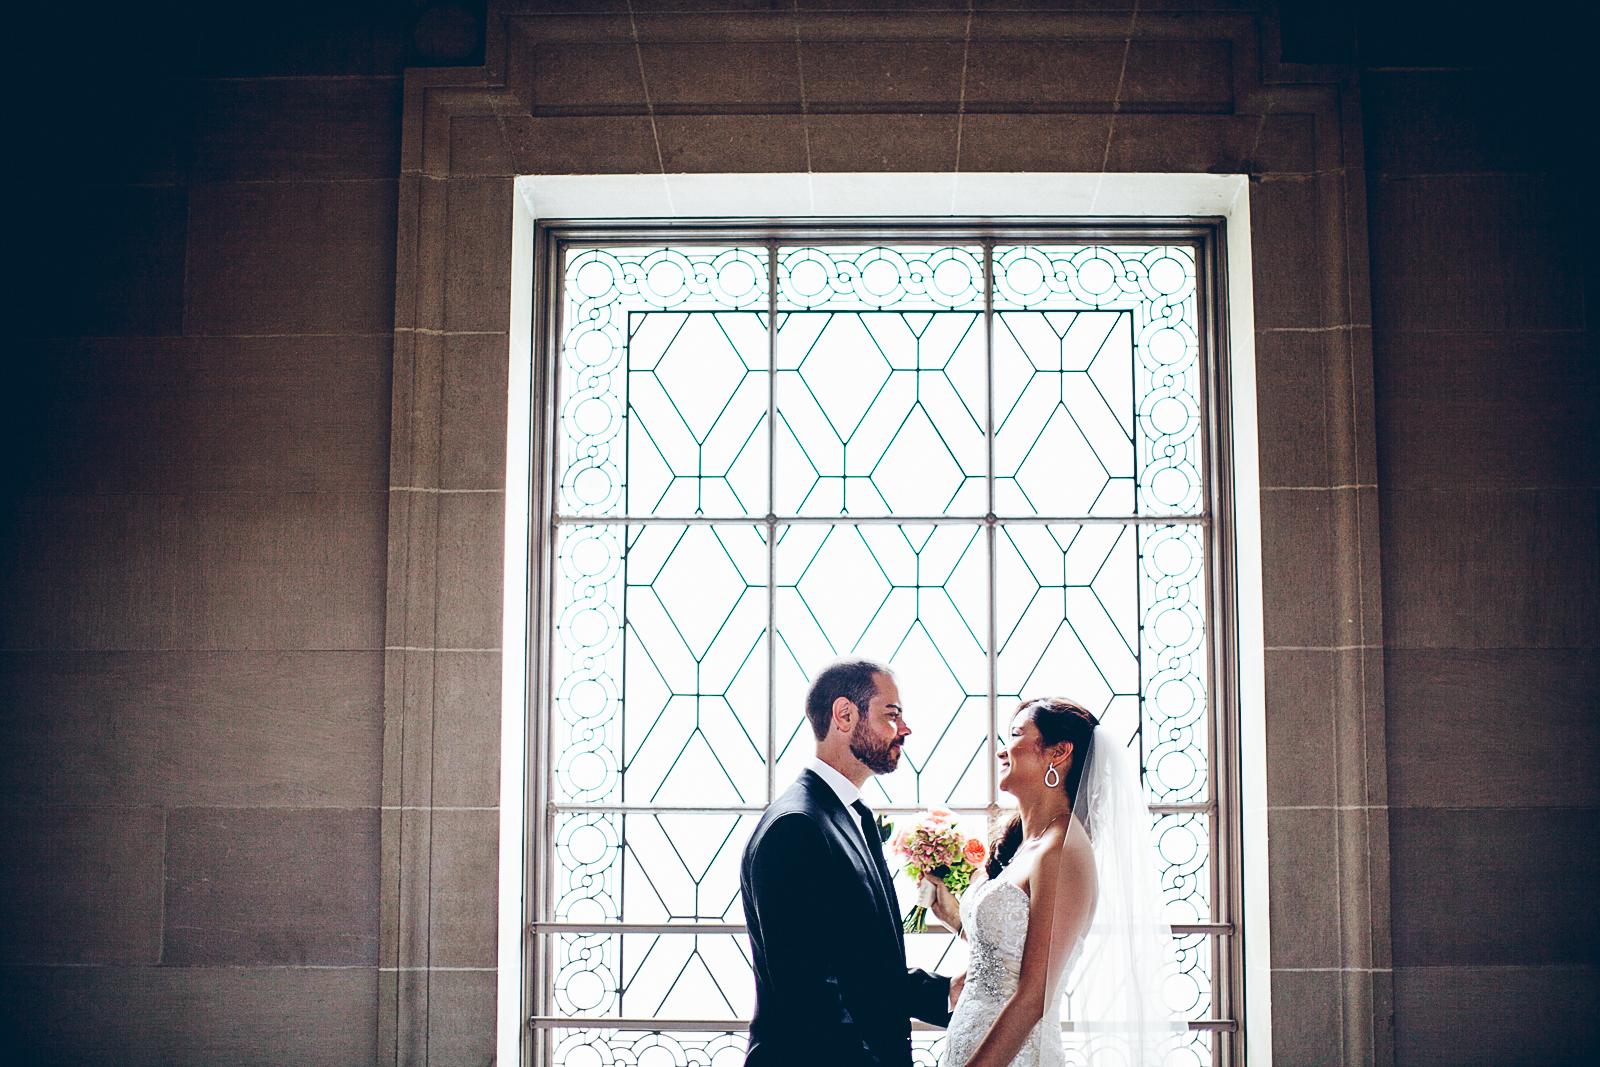 San_francisco_city_hall_wedding_photography_meegan_travis_ebony_siovhan_bokeh_photography_49.jpg